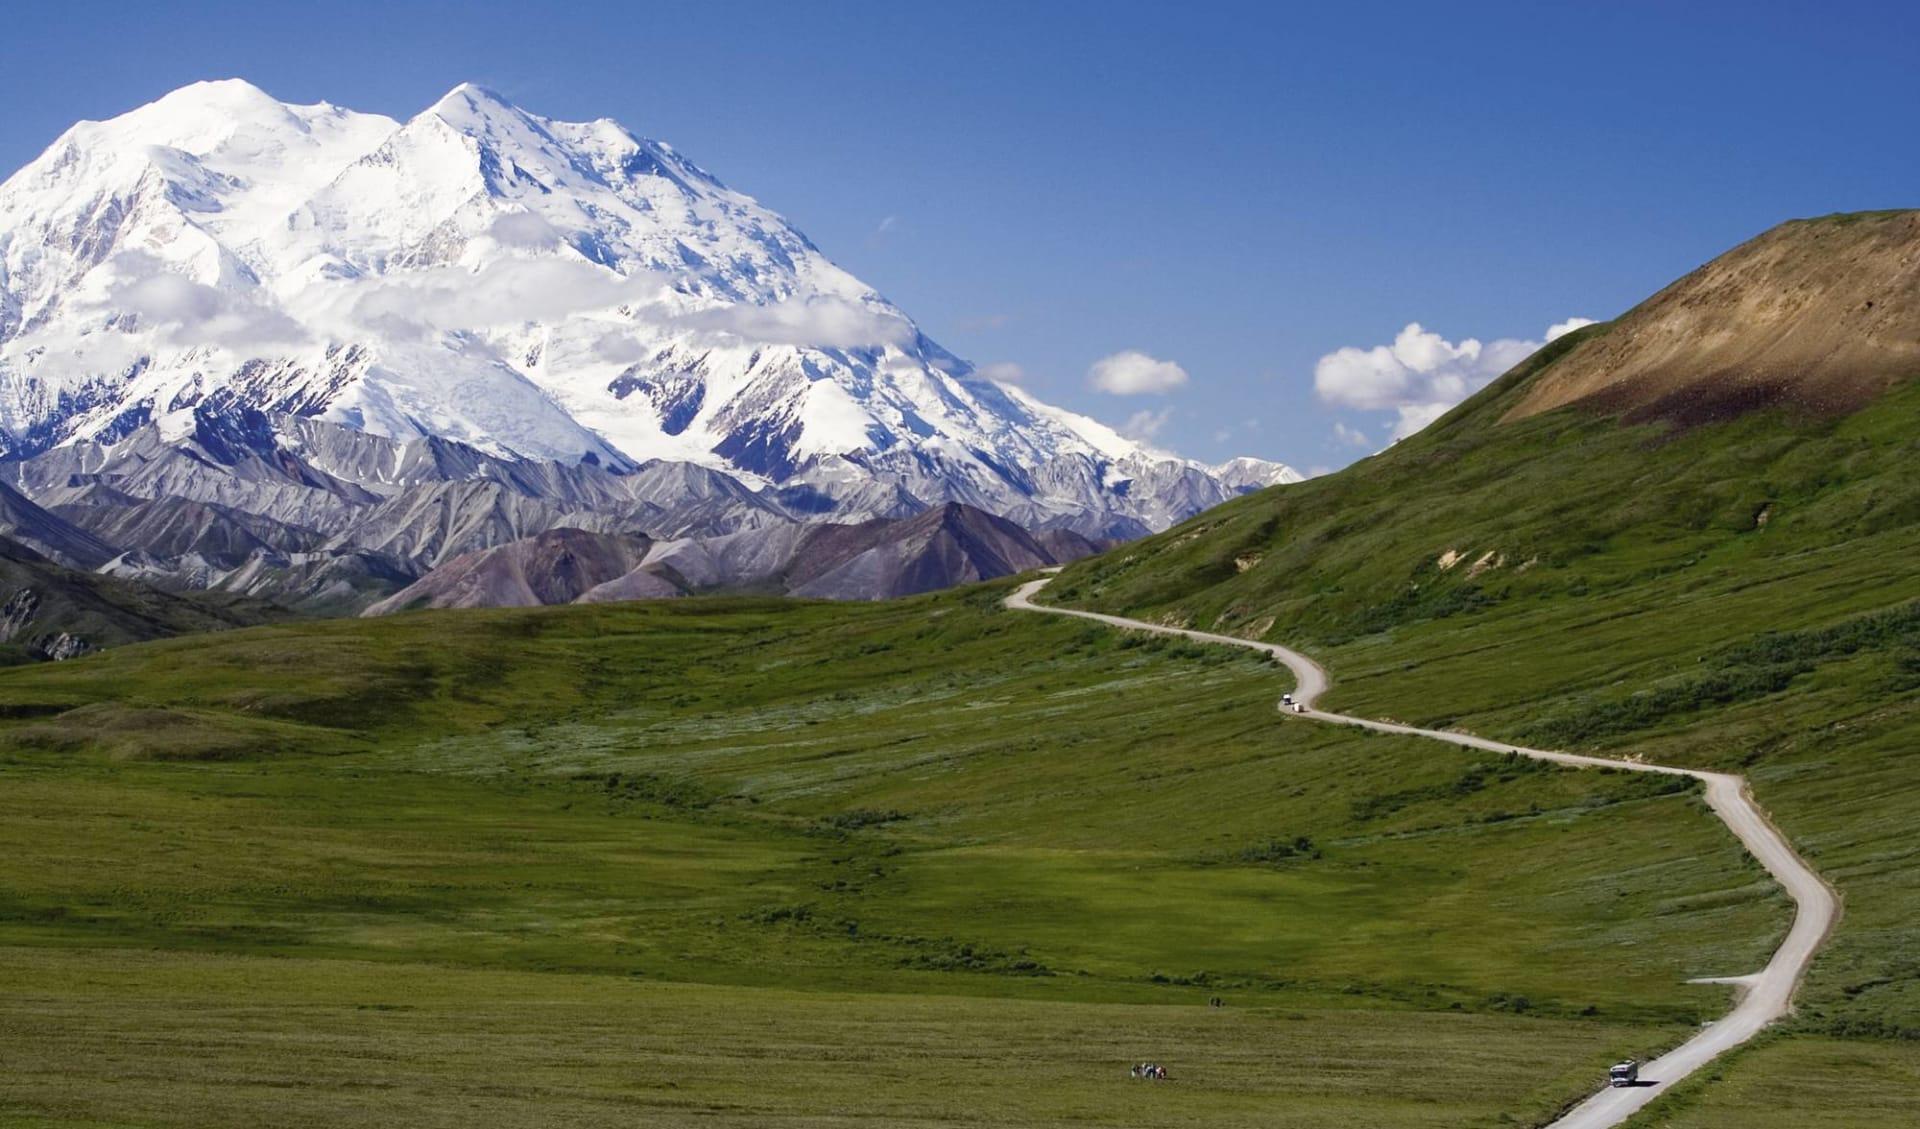 Spirit of the North ab Anchorage: Alaska - Denali Nationalpark - Denali Parkroad